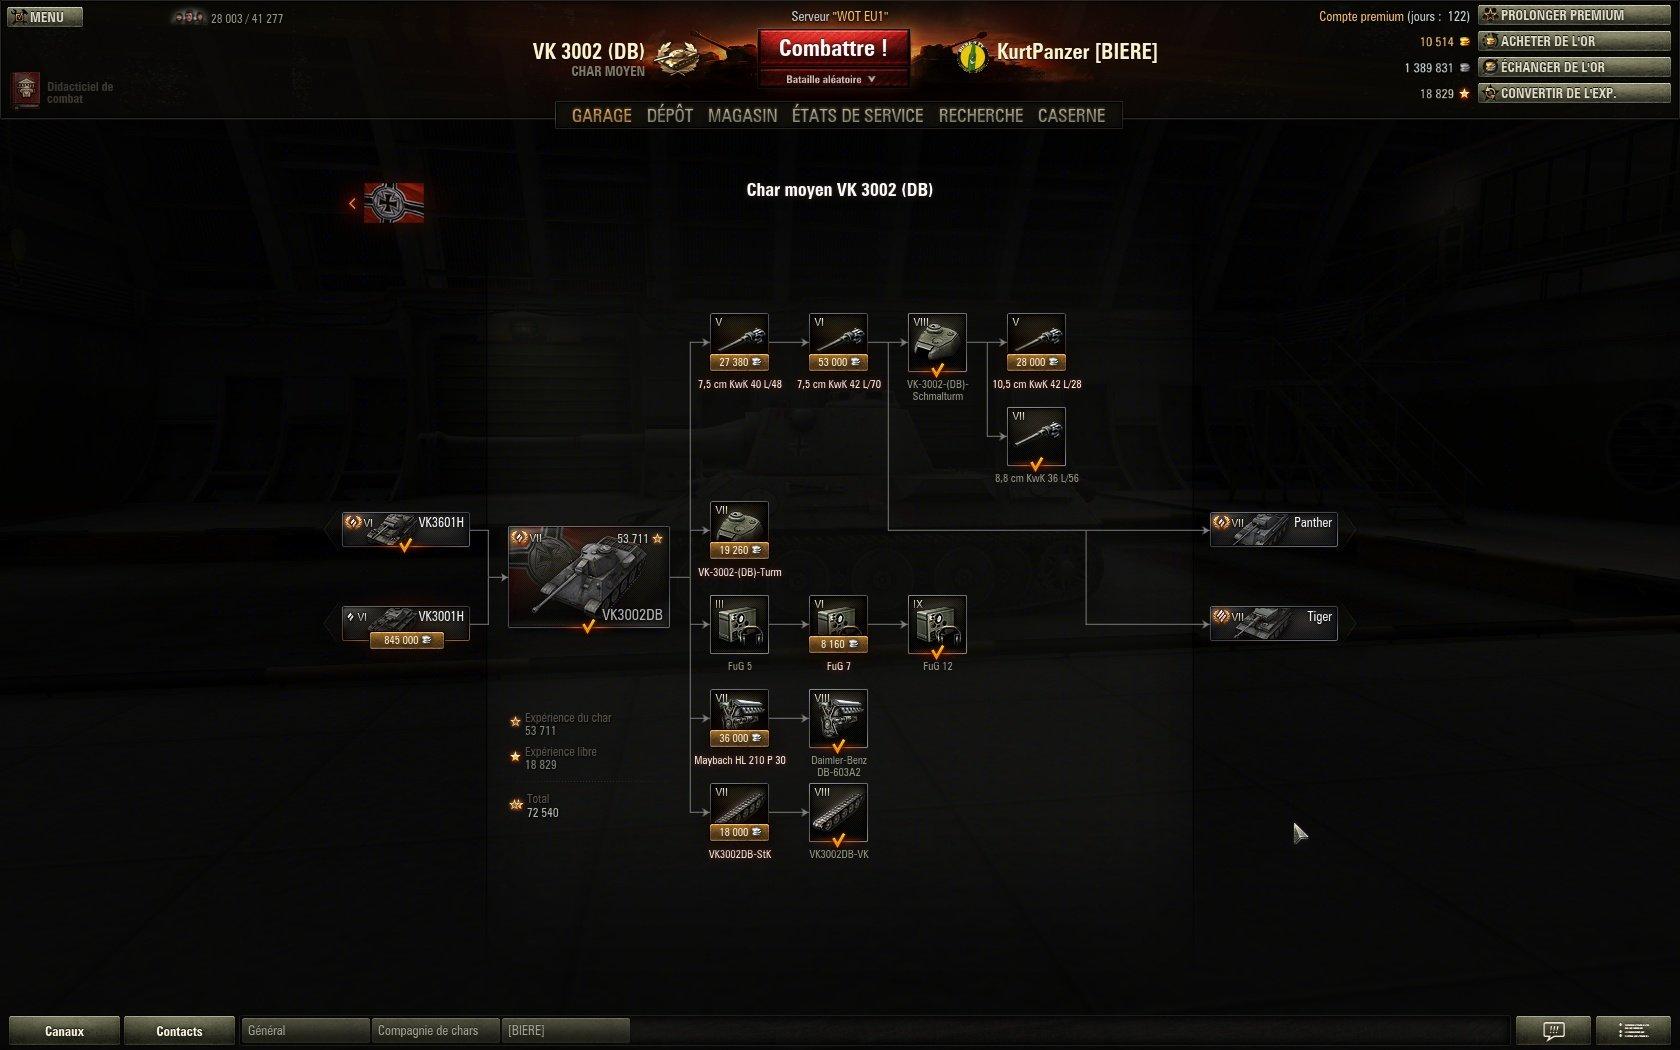 World of Tanks  Da4db26a-e18b-4c62-8630-5be1c0c69ea9